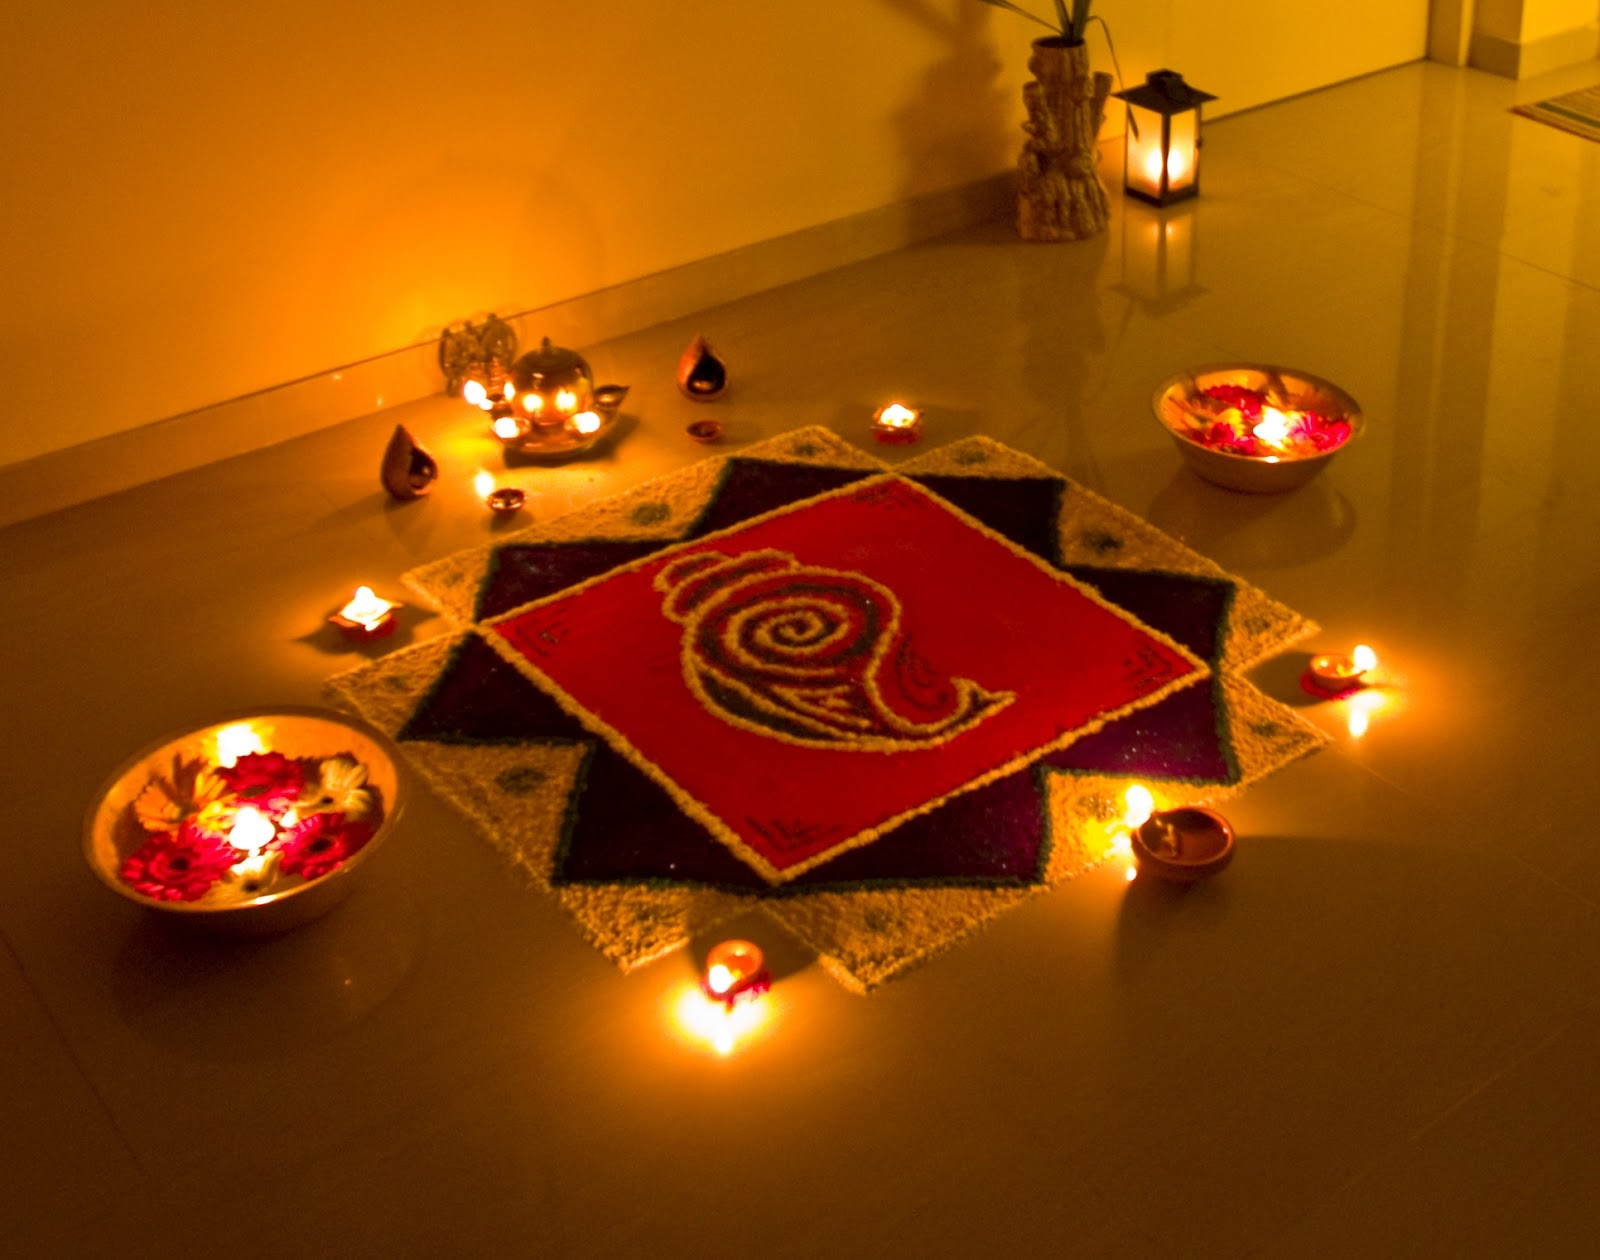 Rangoli for diwali festival hindu festivals for Home rangoli designs